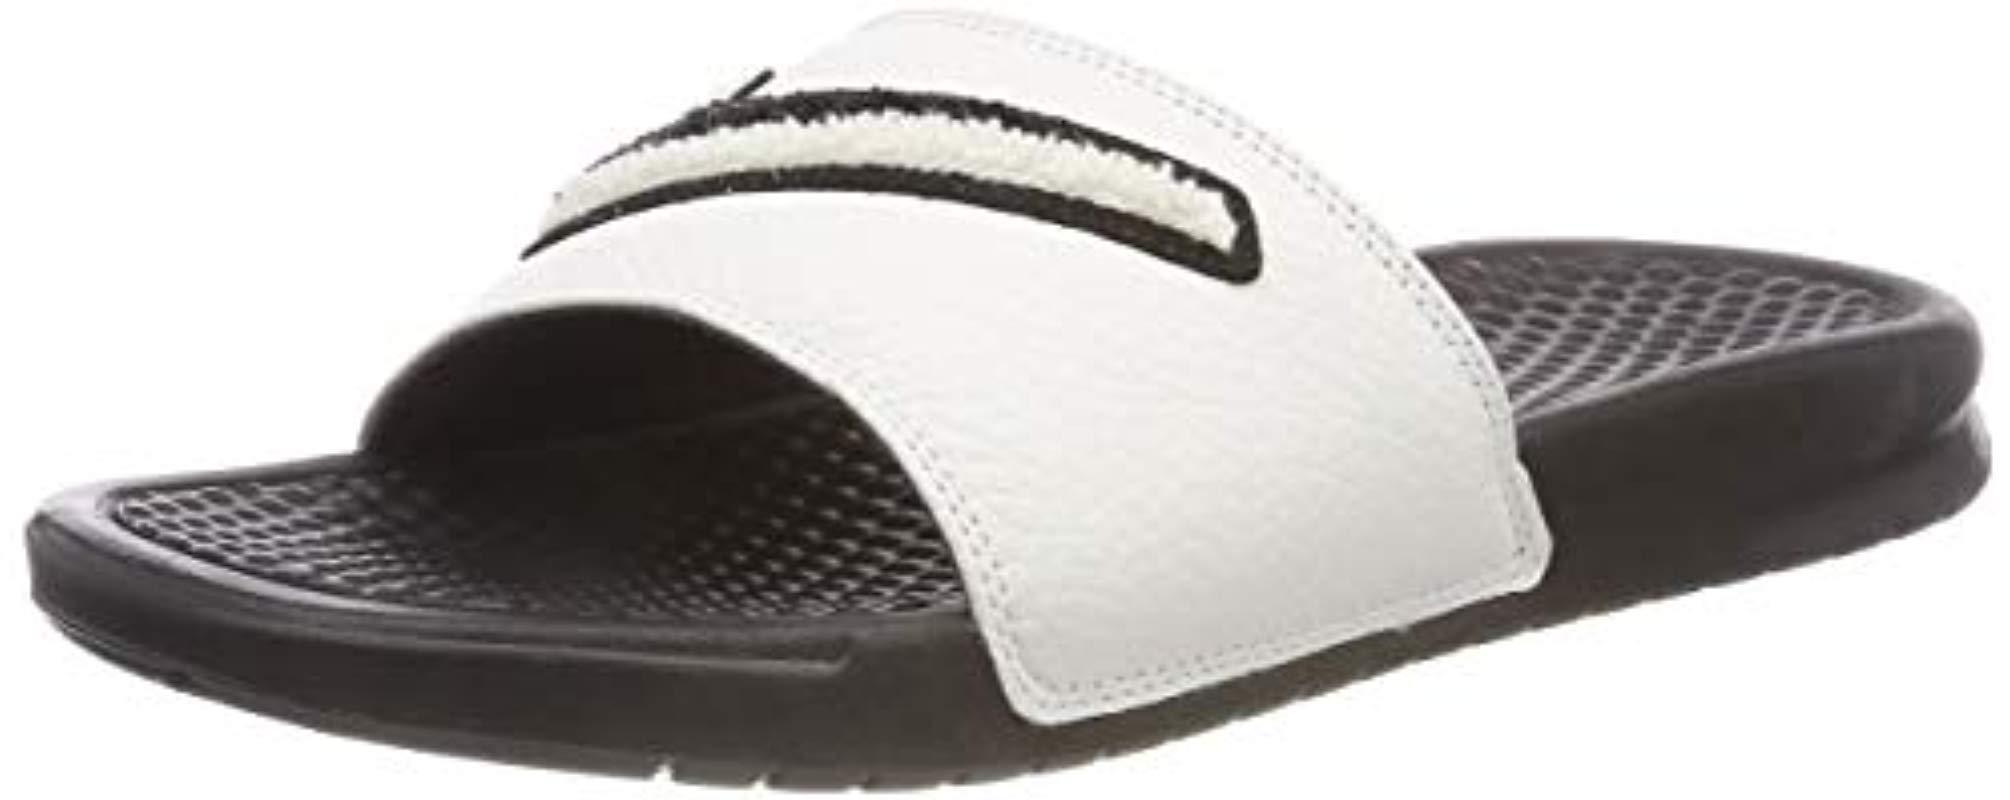 9082c1548143e2 Nike  s Benassi Jdi Chenille Beach And Pool Shoes in Black for Men ...